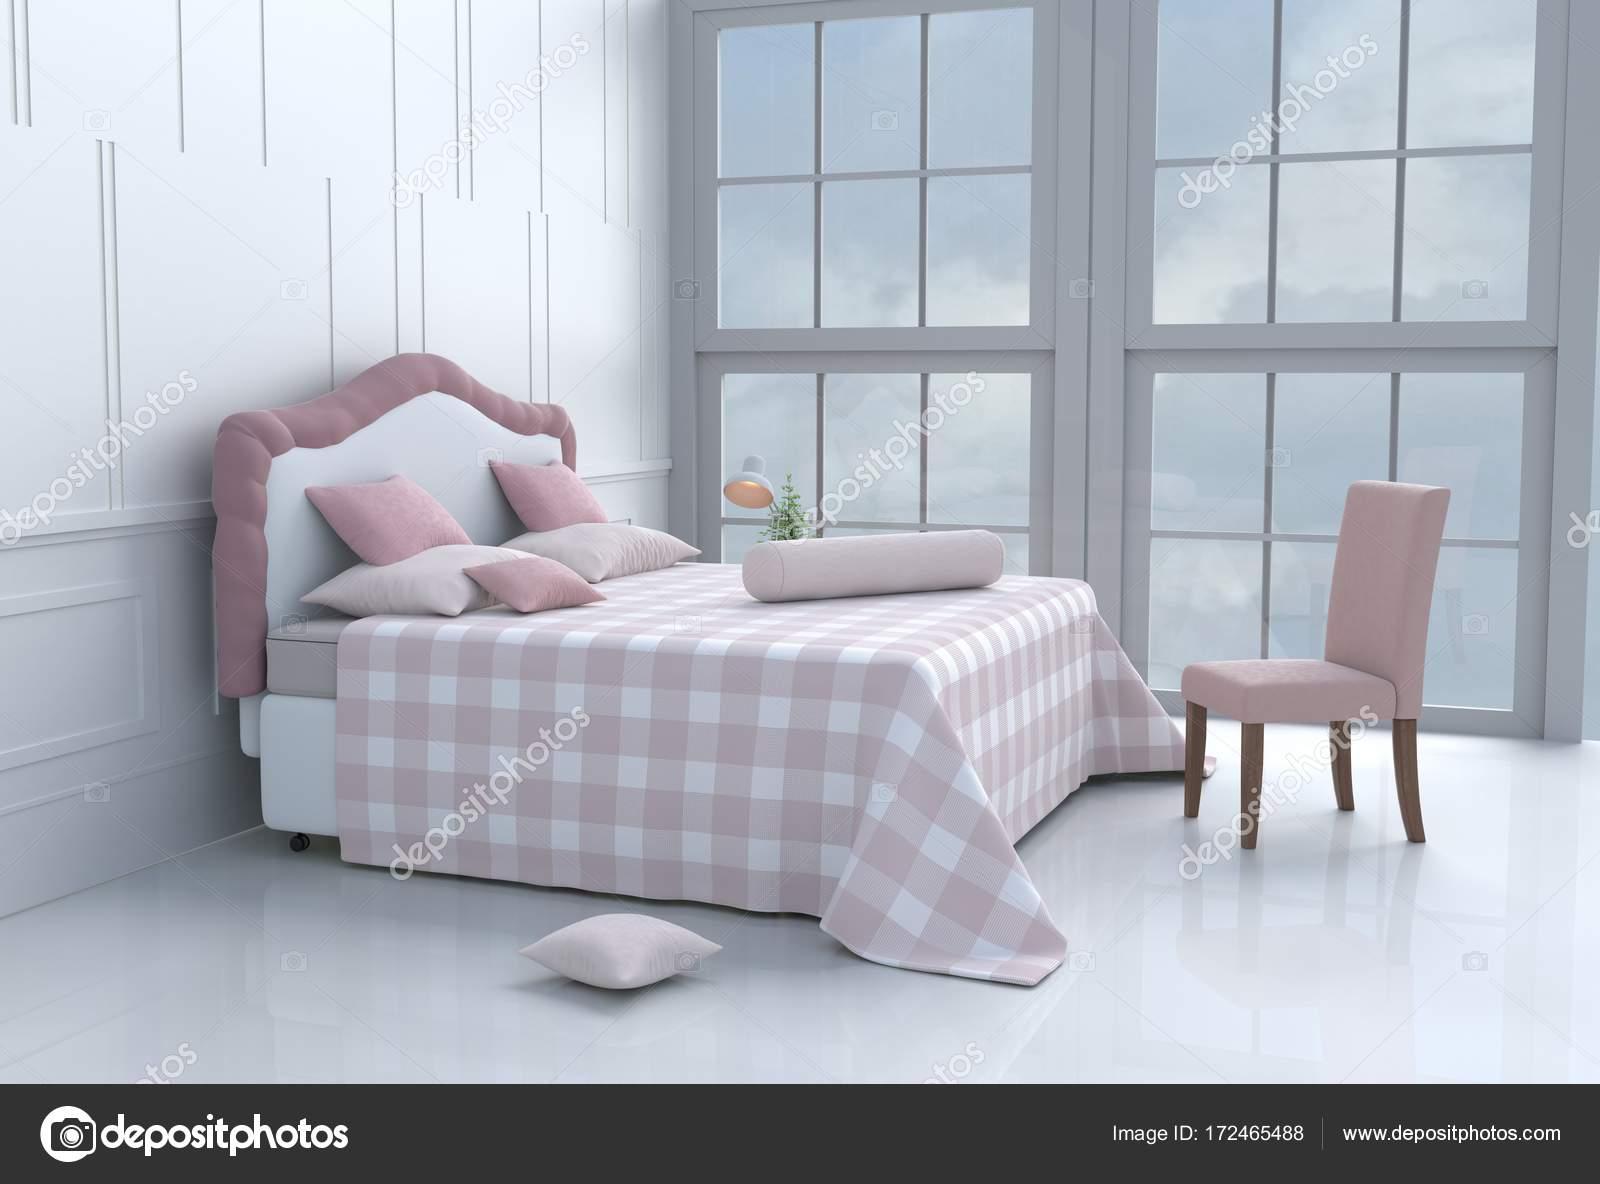 Roze Slaapkamer Lamp : Wit slaapkamer ingericht met boom in glazen vaas roze oranje